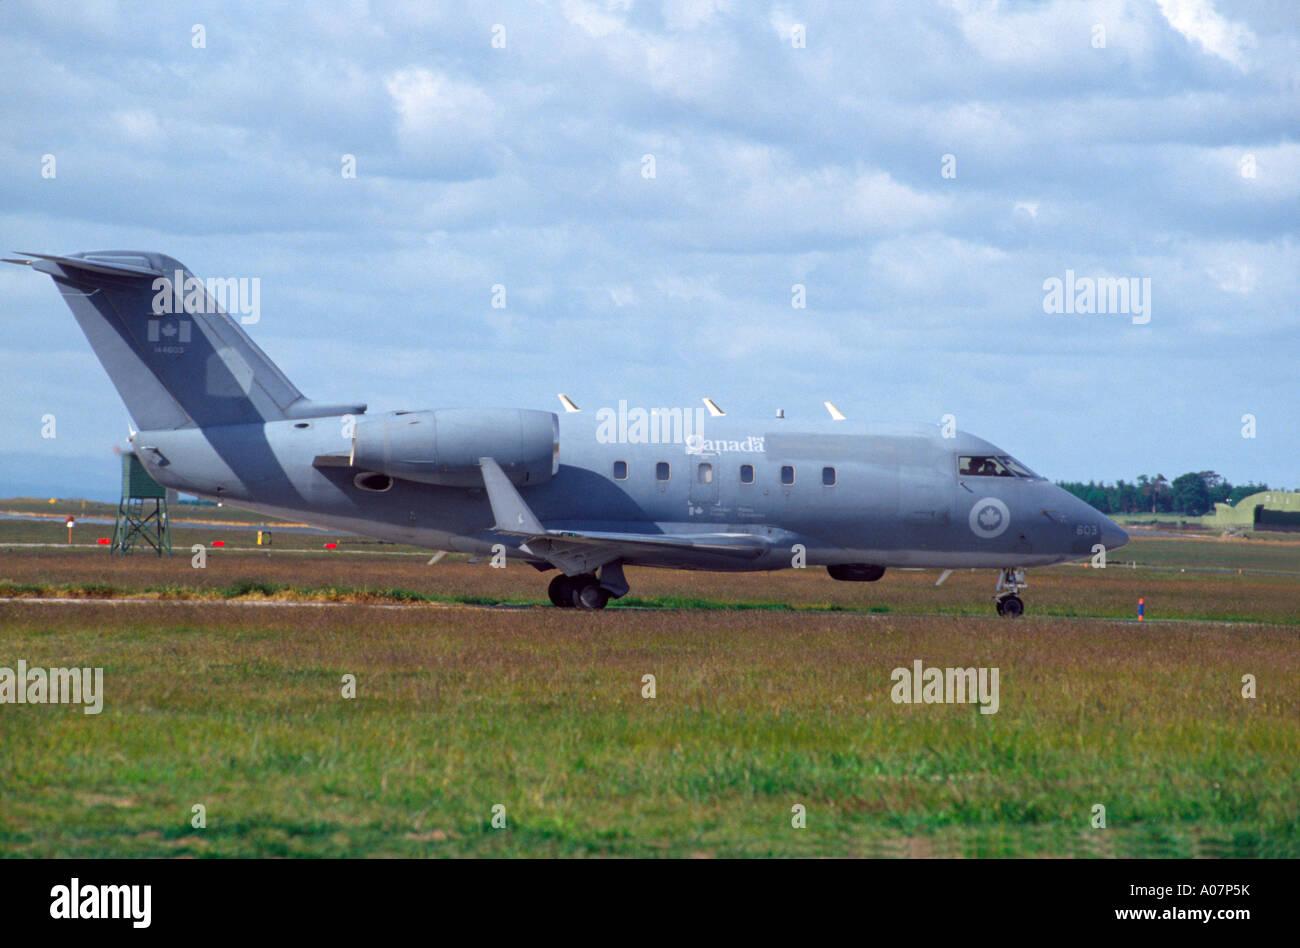 Canadair CC-144 Challenger Military Transport.  GAV 4023-383 - Stock Image